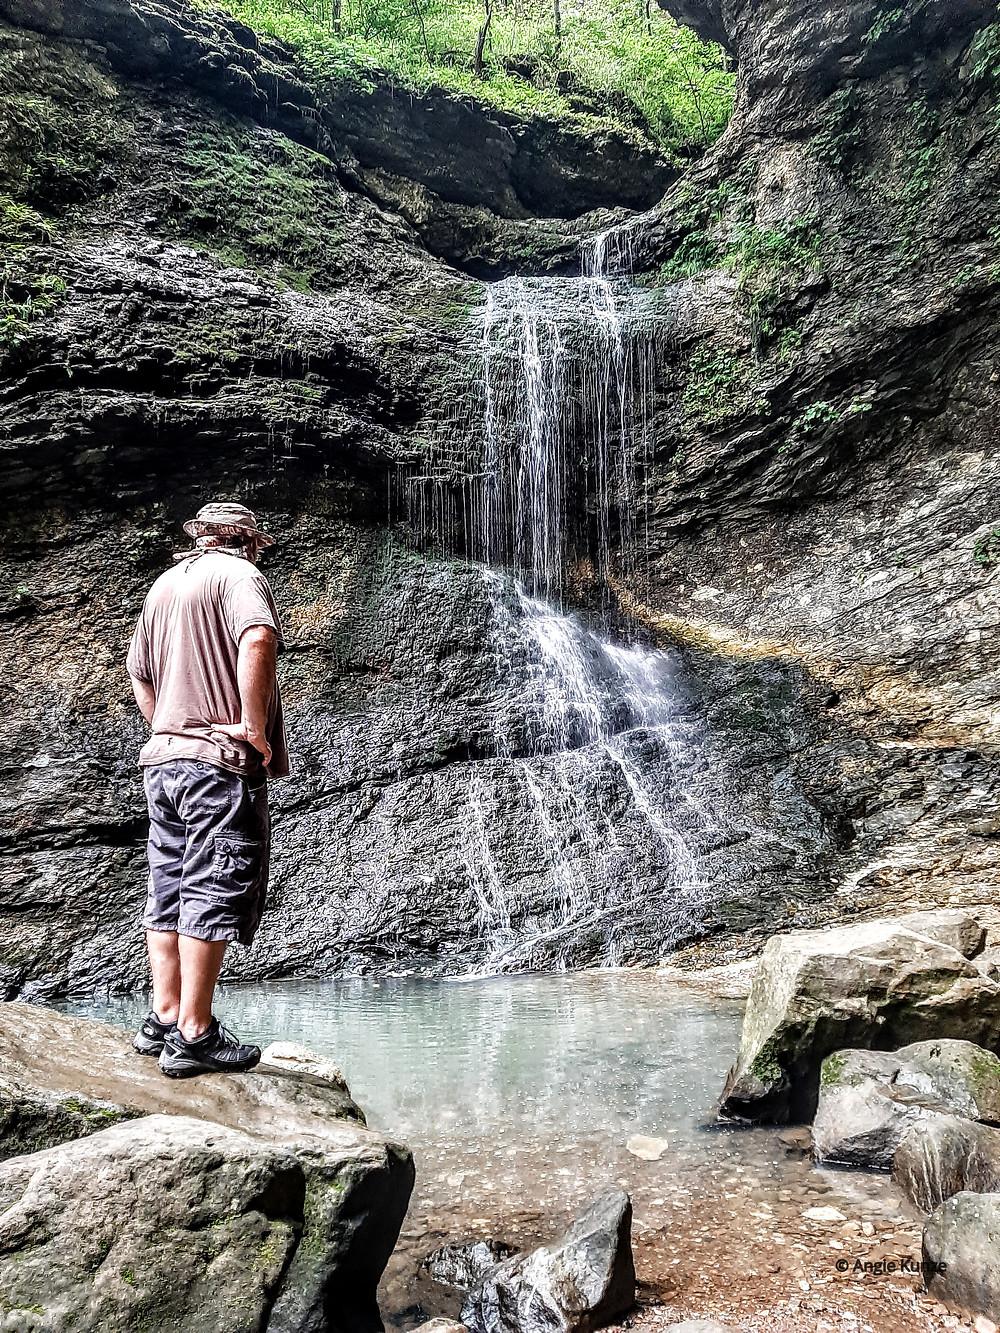 Lost Valley hiking trail, Buffalo River National Park near Ponca Arkansas waterfall